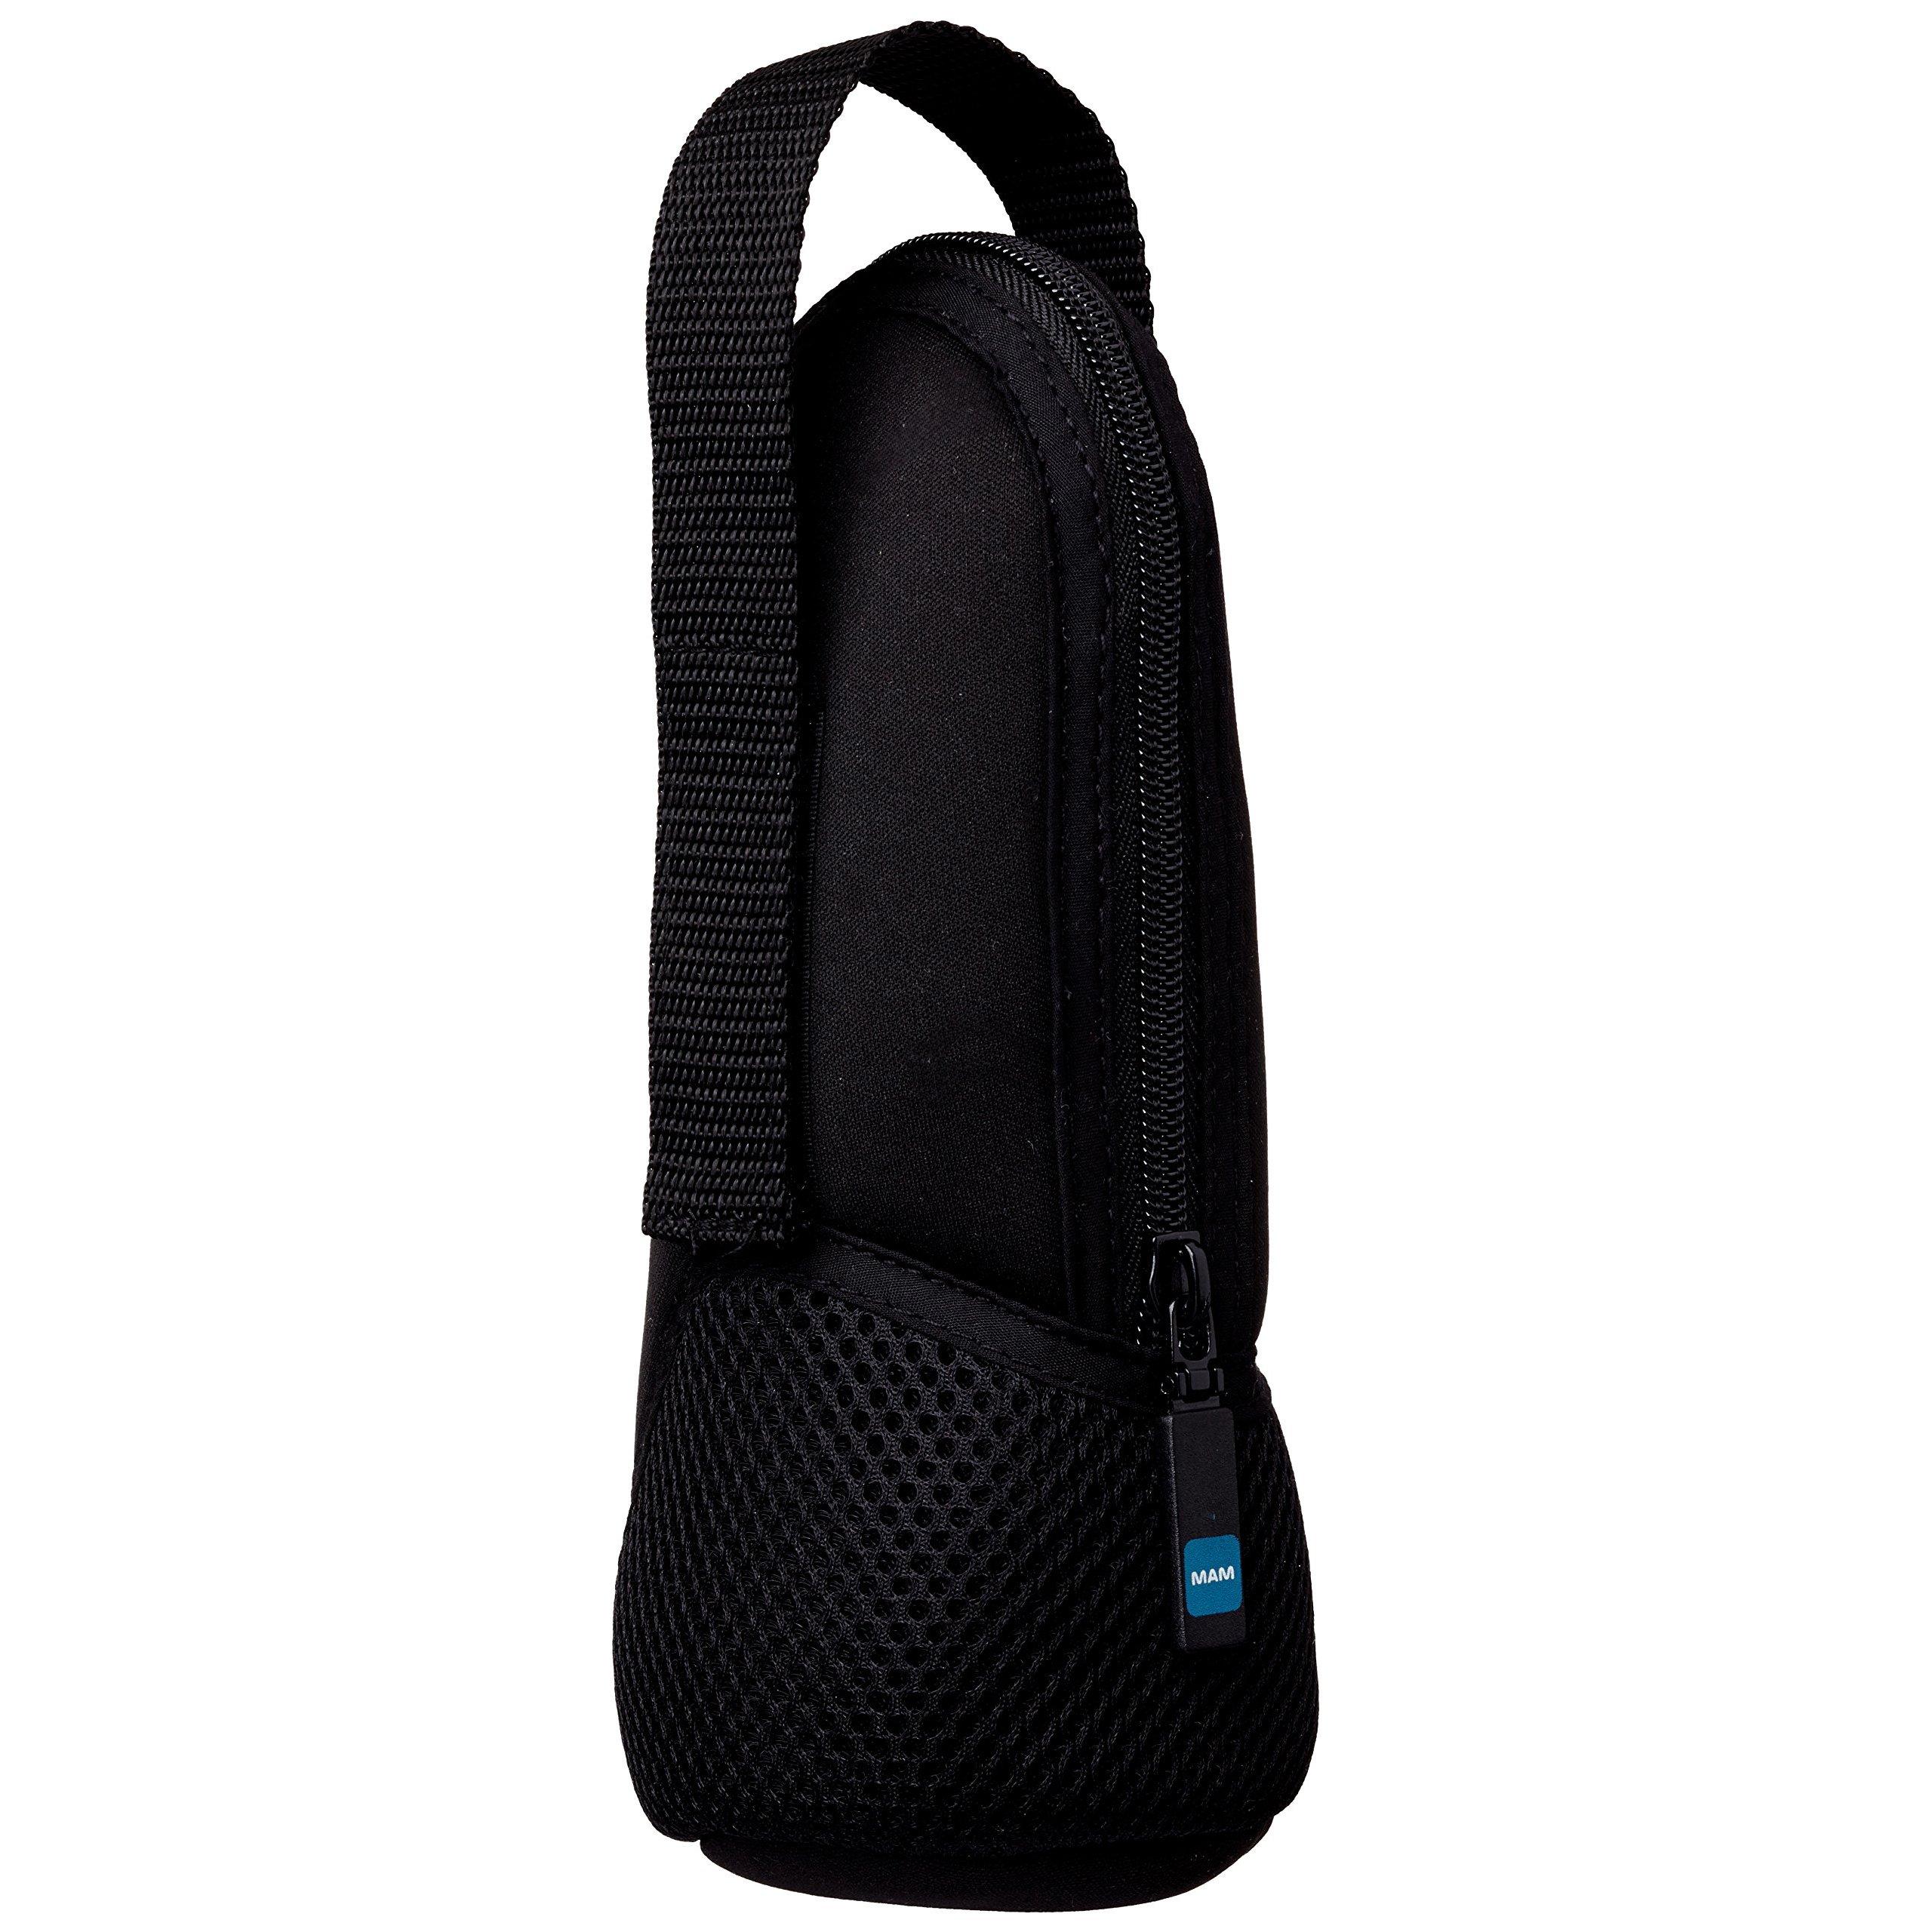 Mam Thermal Bag Θερμομονωτική Θήκη για Μπιμπερό Κωδ 780, 1 Τεμάχιο – μαύρο